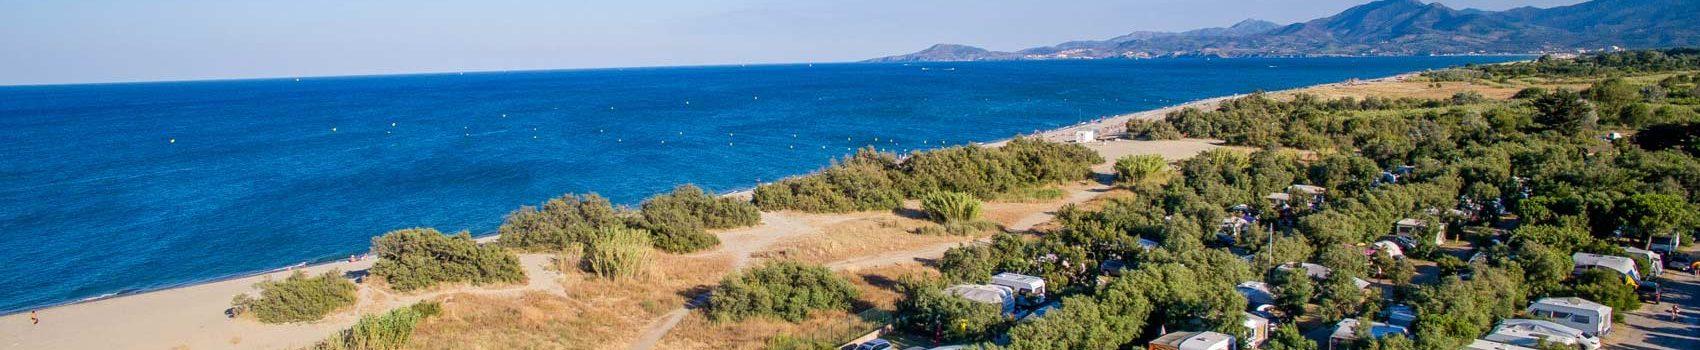 camping st cyprien bord de mer